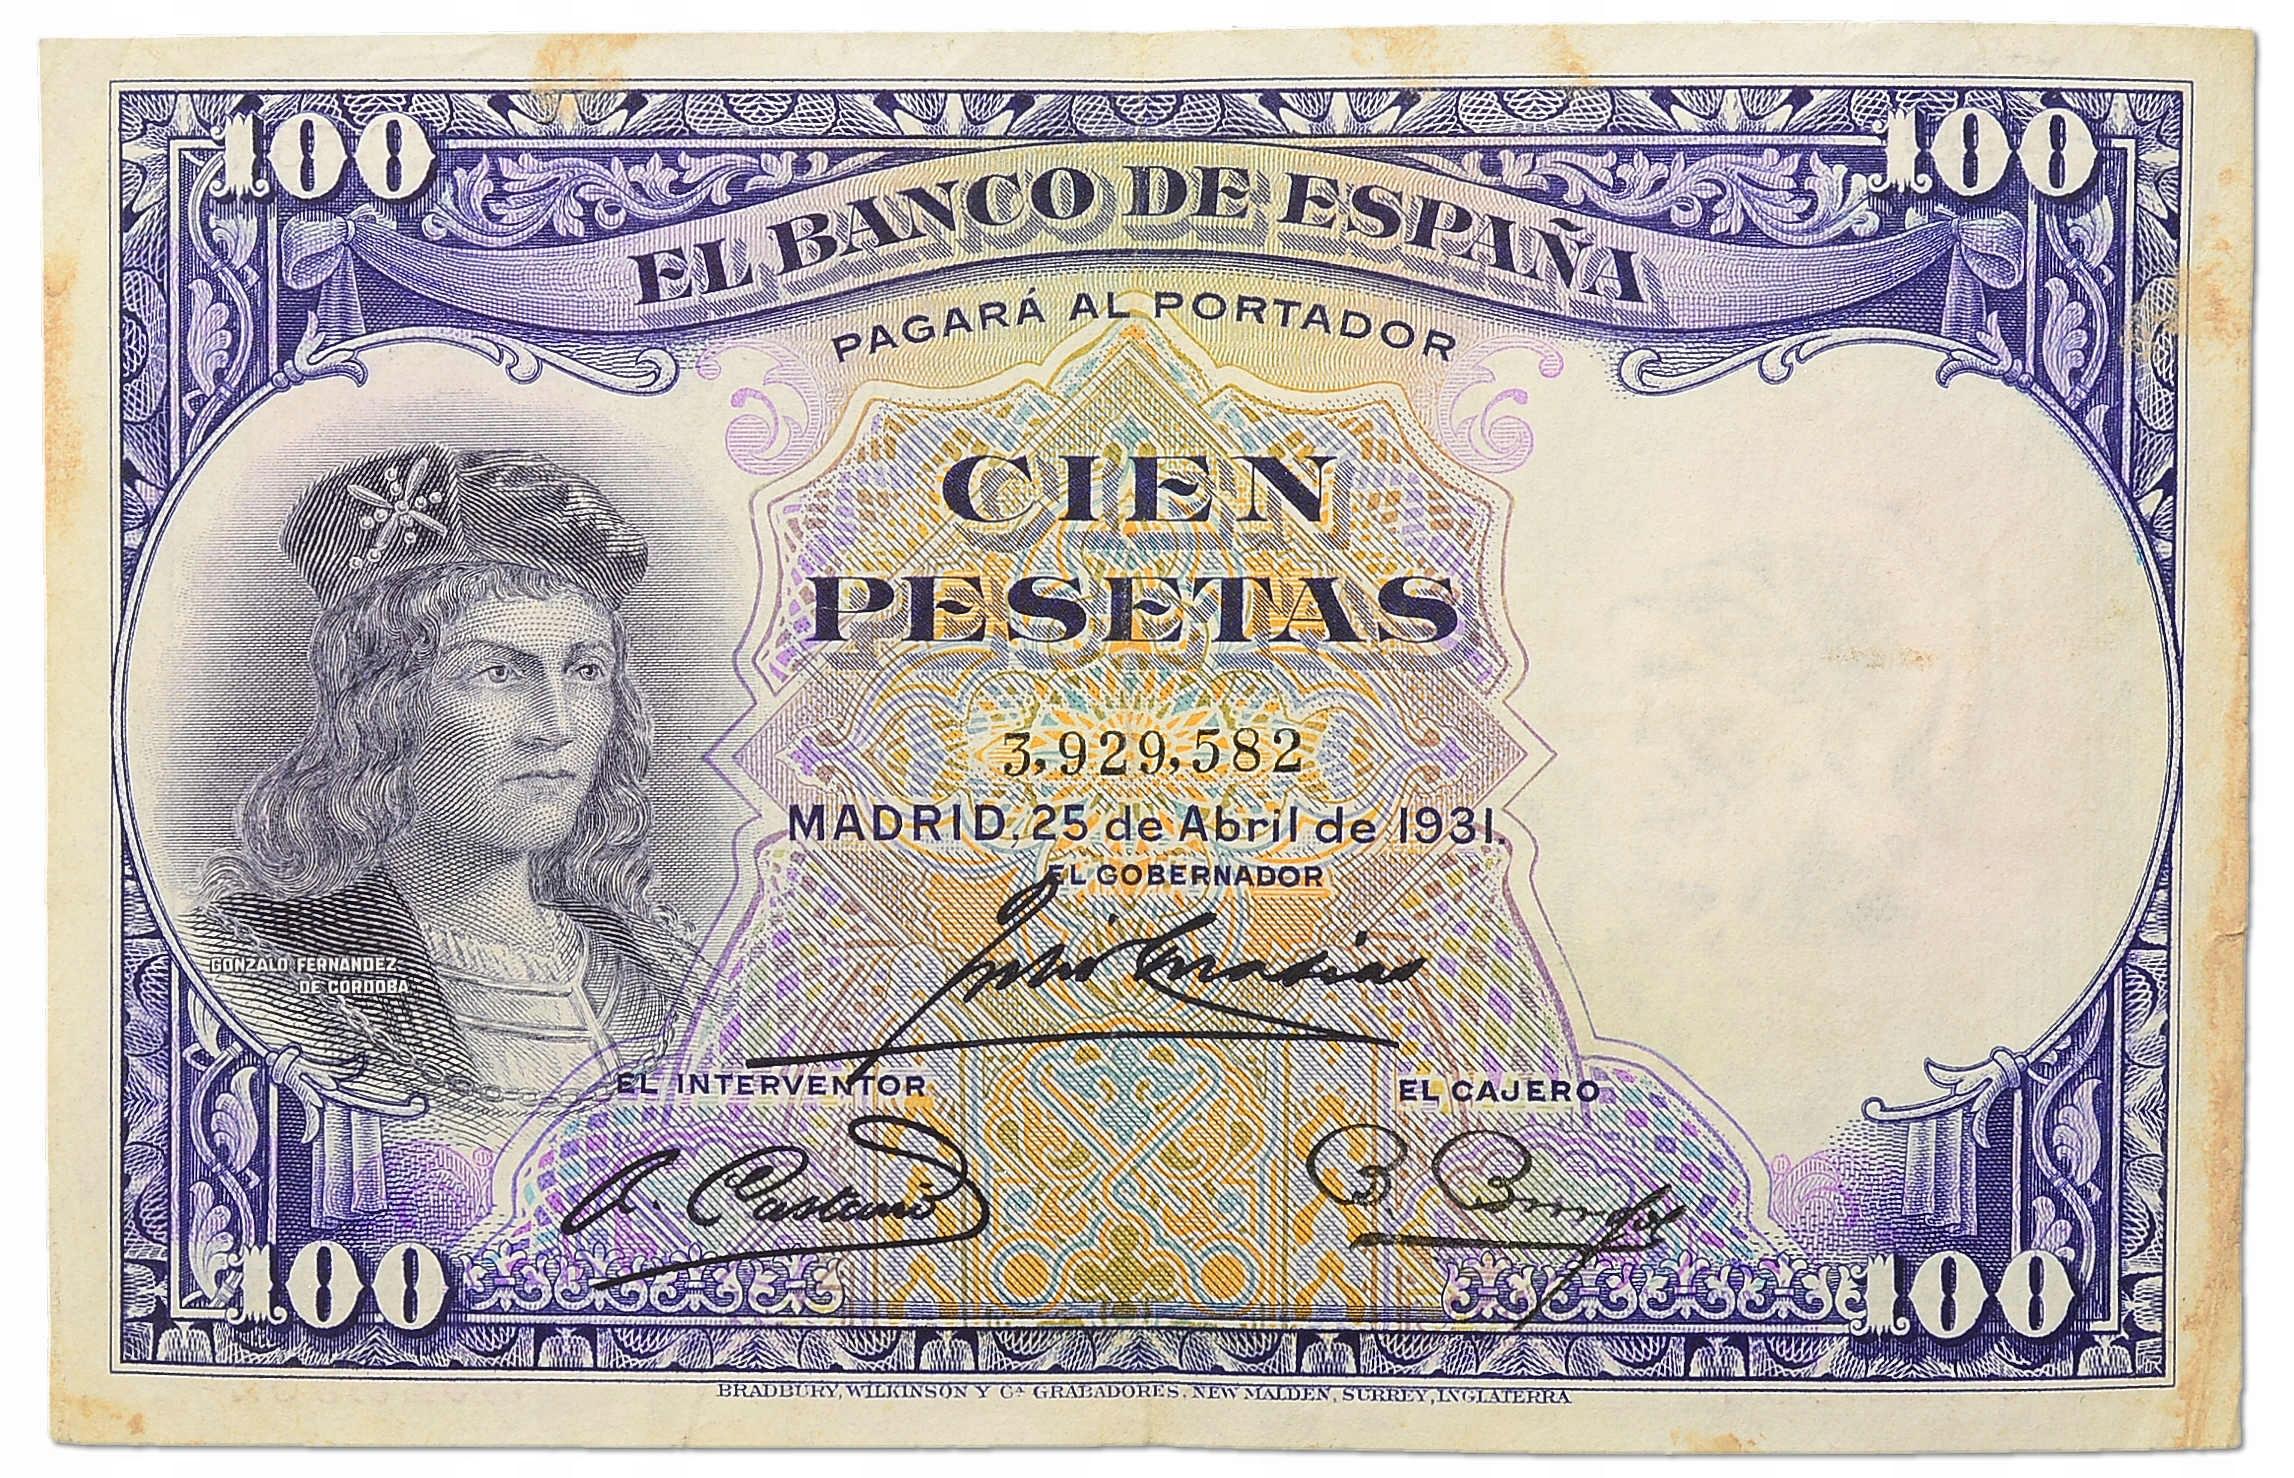 11.Hiszpania, 100 Peset 1931, P.83, St.3